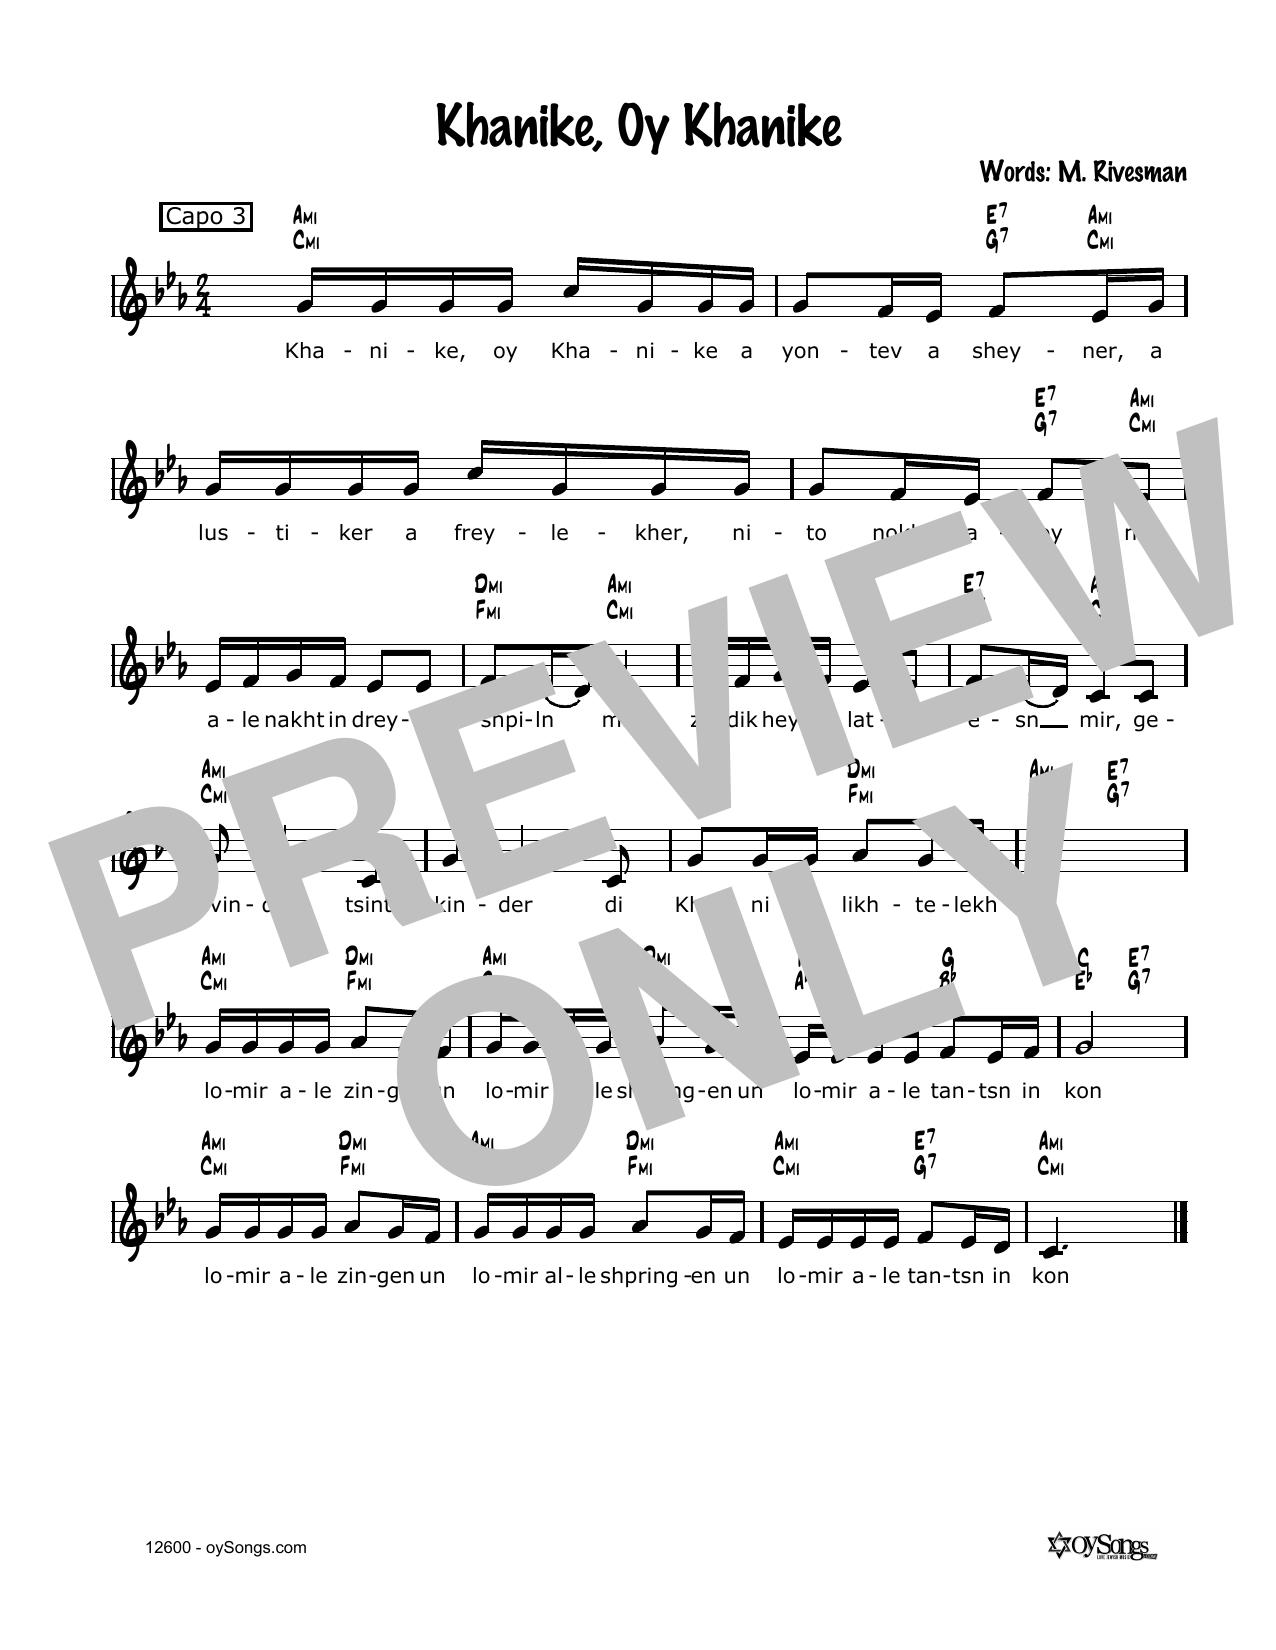 Khanike, Oy Khanike (Melody Line, Lyrics & Chords)